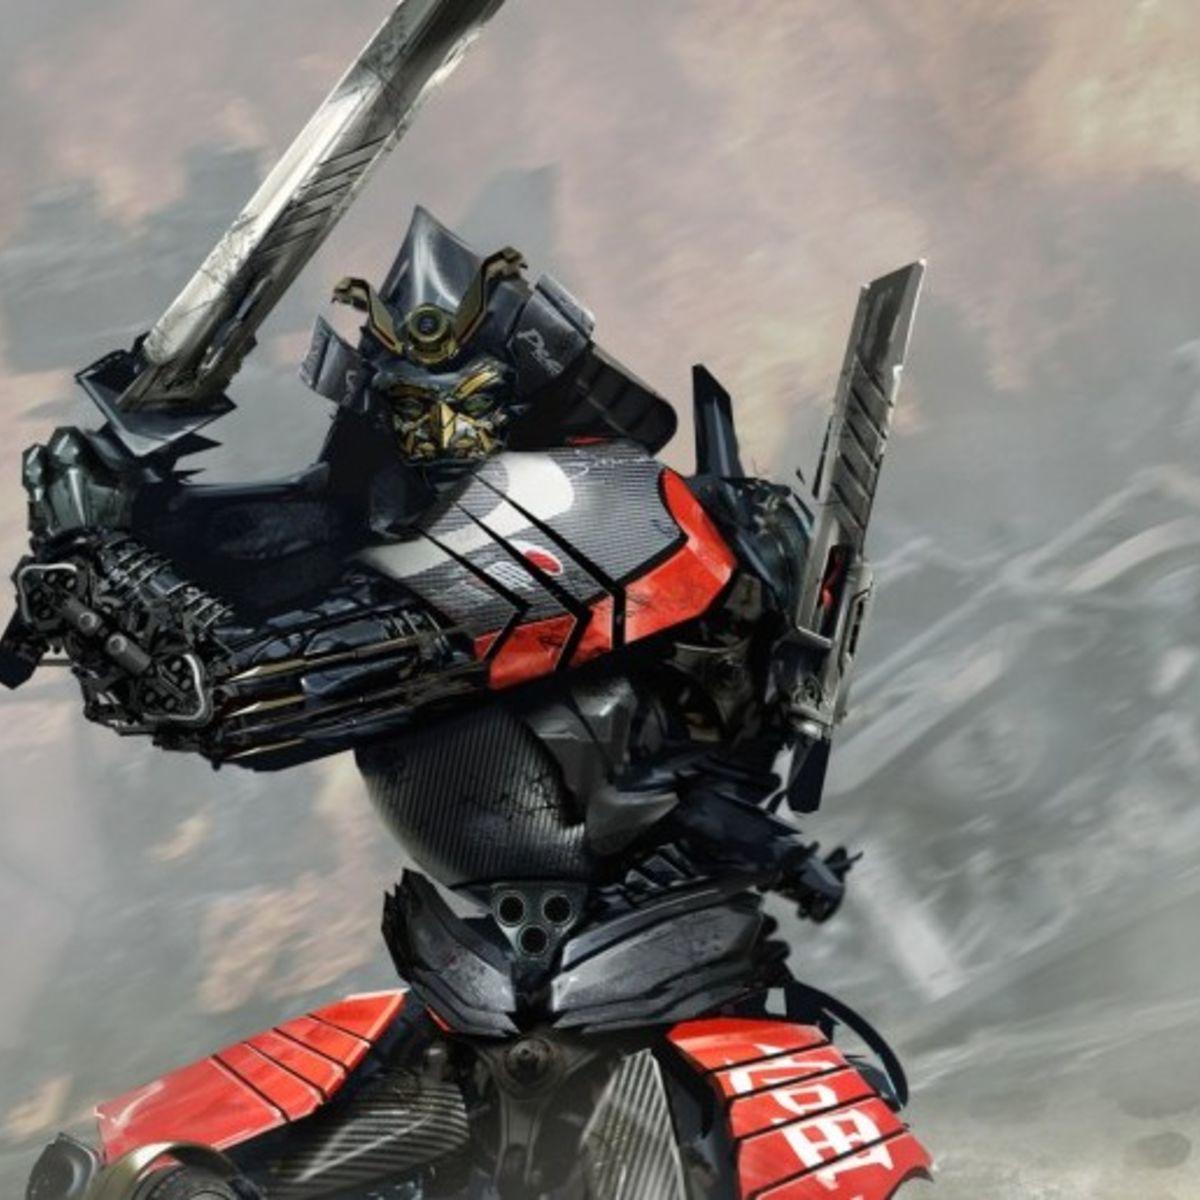 tTransformers_Age_of_Extinction_Cocnept_Art_EN02_Samurai-680x928.jpg